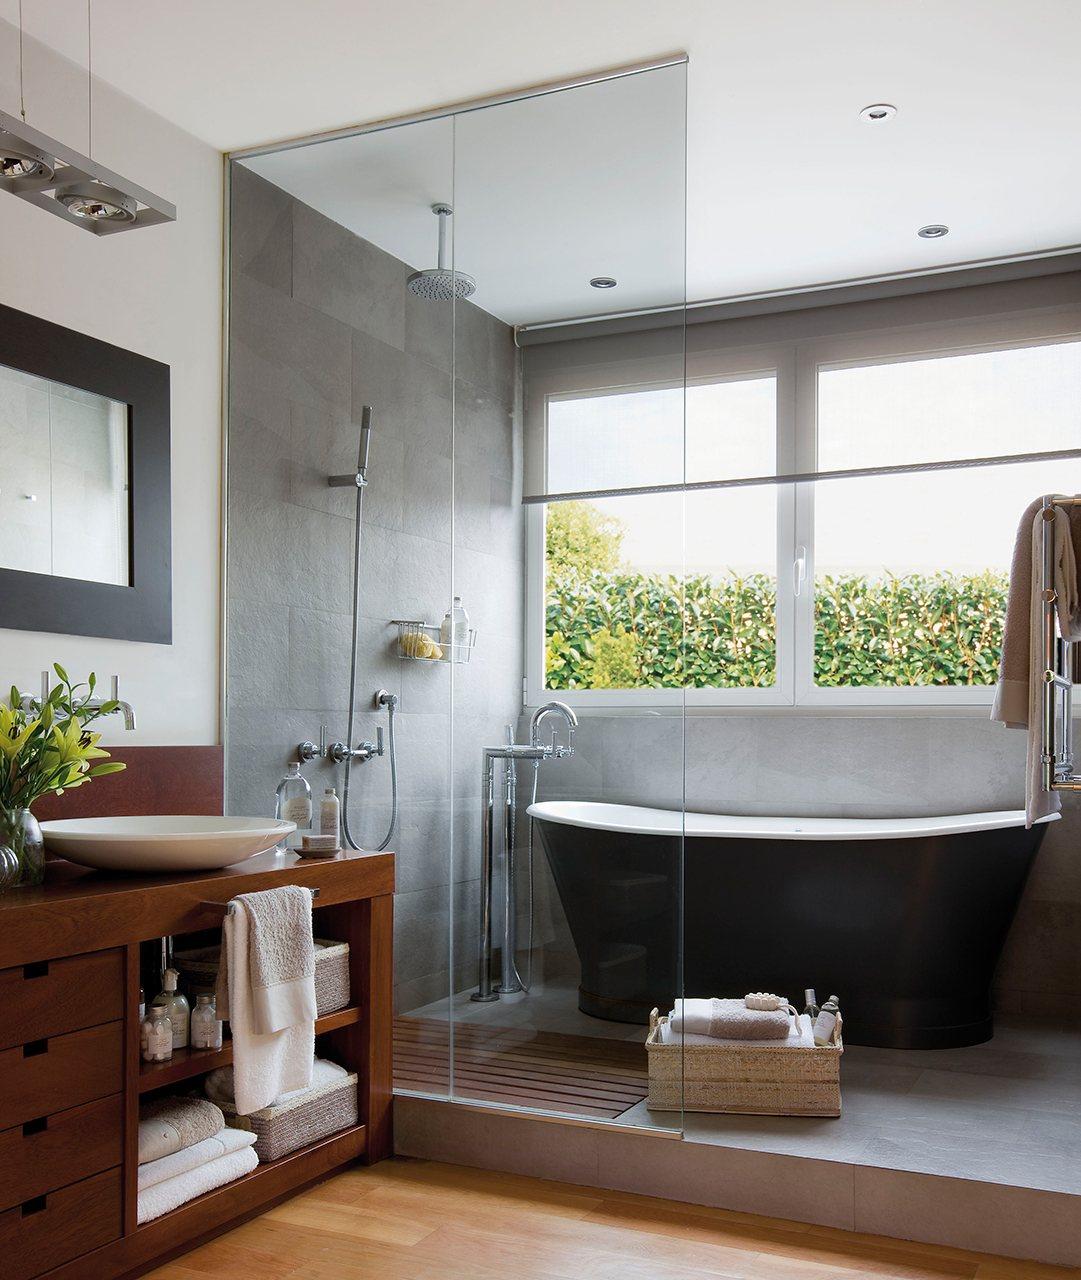 Ba os con ducha el mueble for Banos pequenos con banera